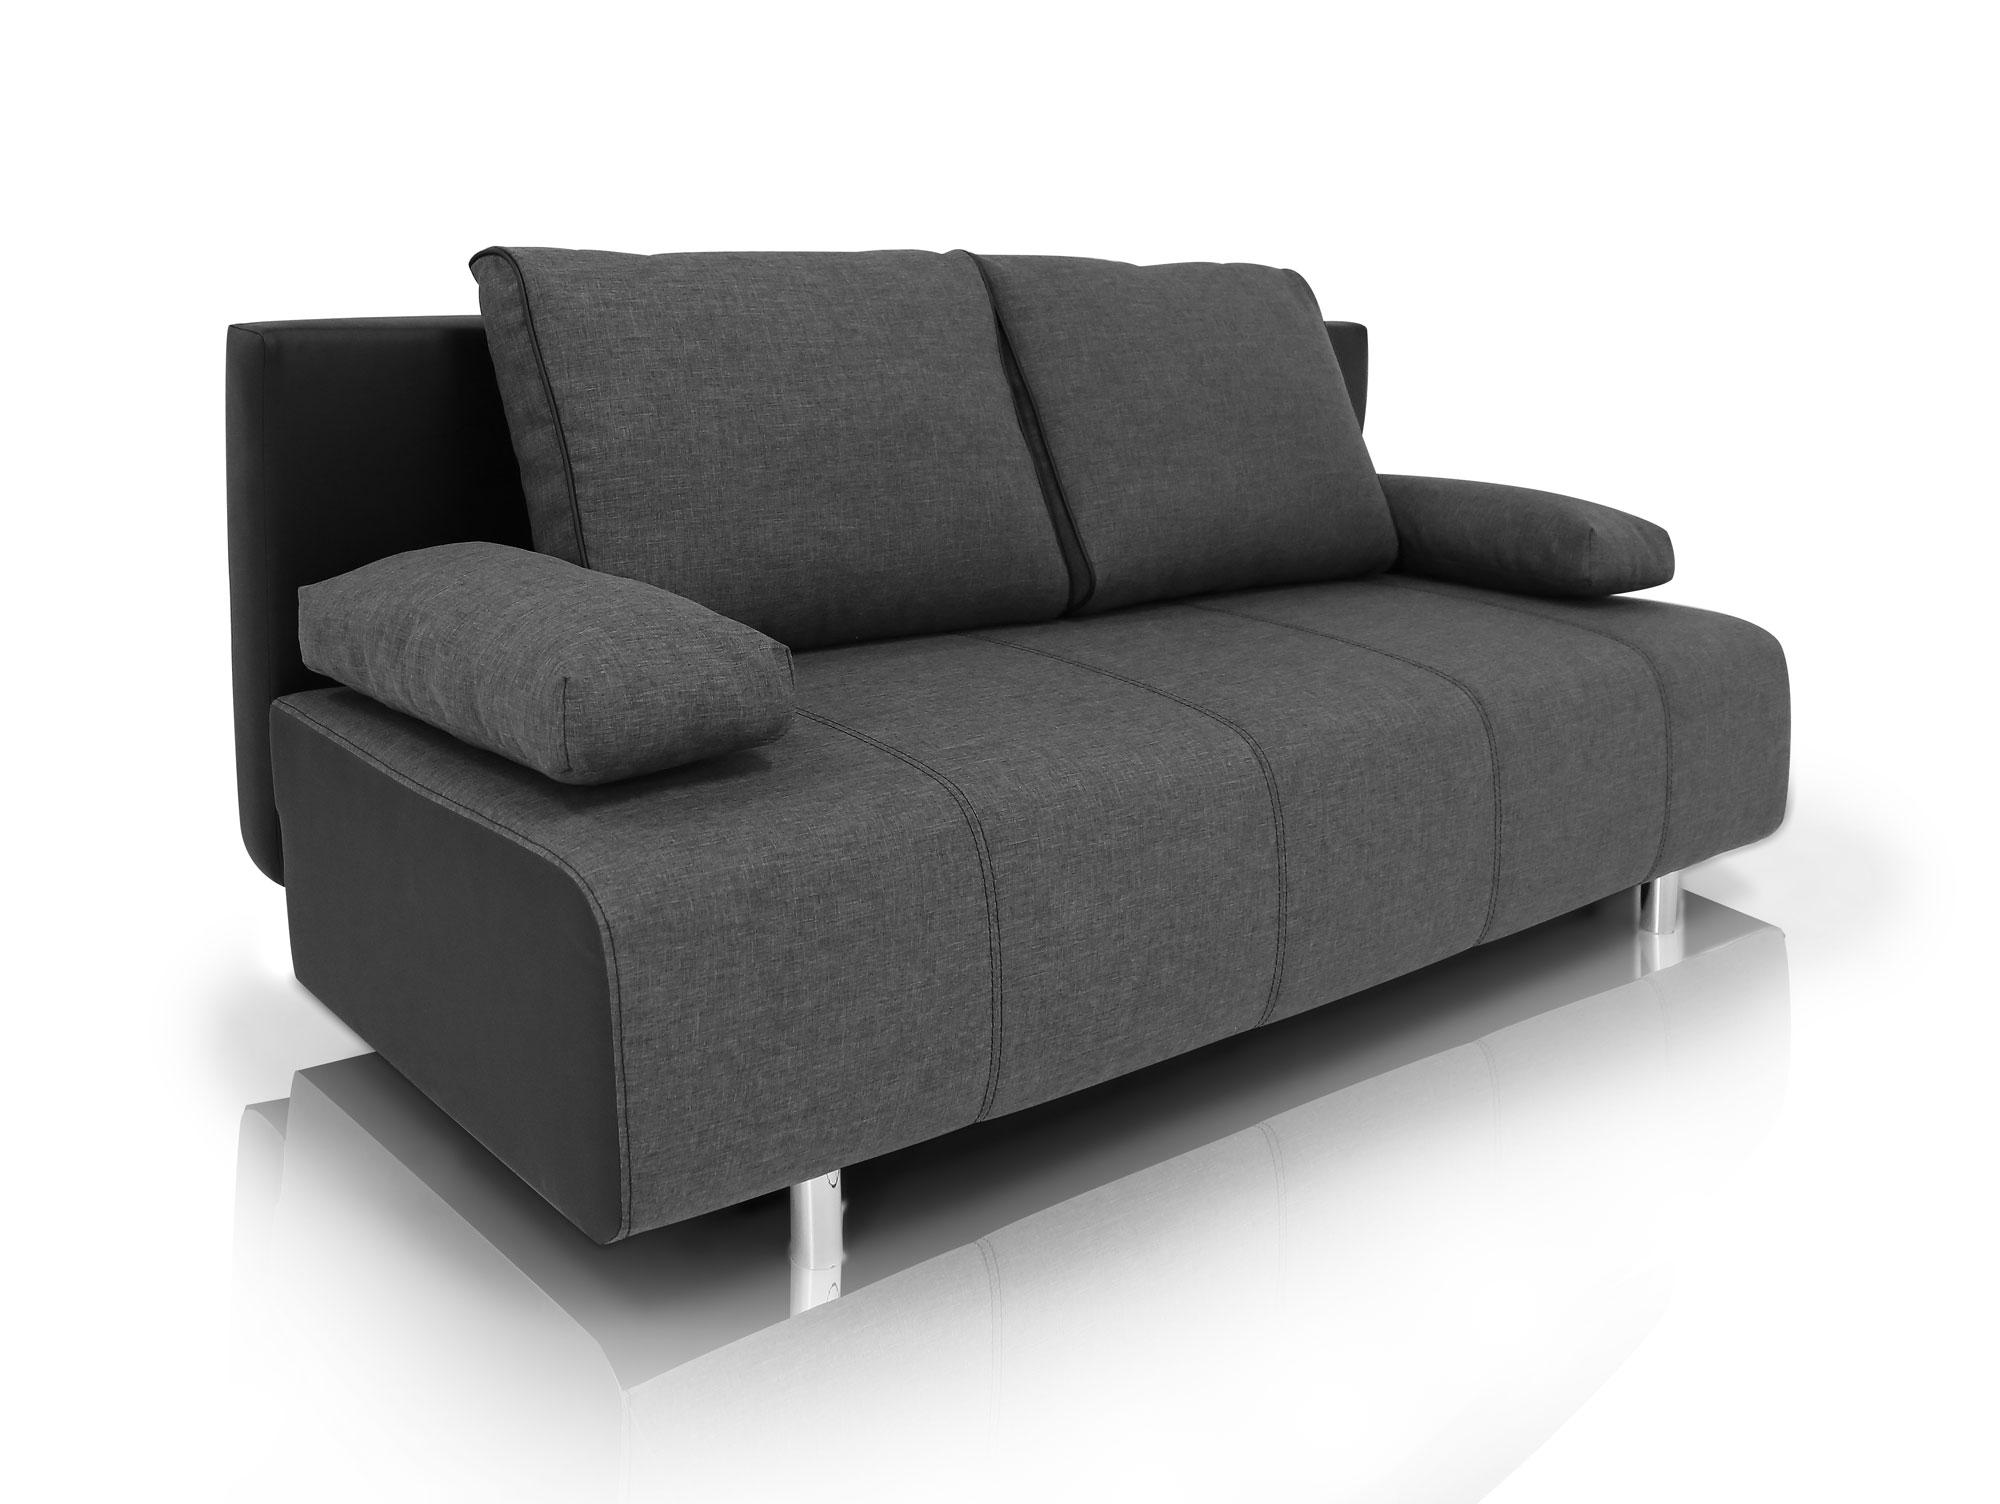 inka schlafsofa schlafcouch schwarz anthrazit. Black Bedroom Furniture Sets. Home Design Ideas